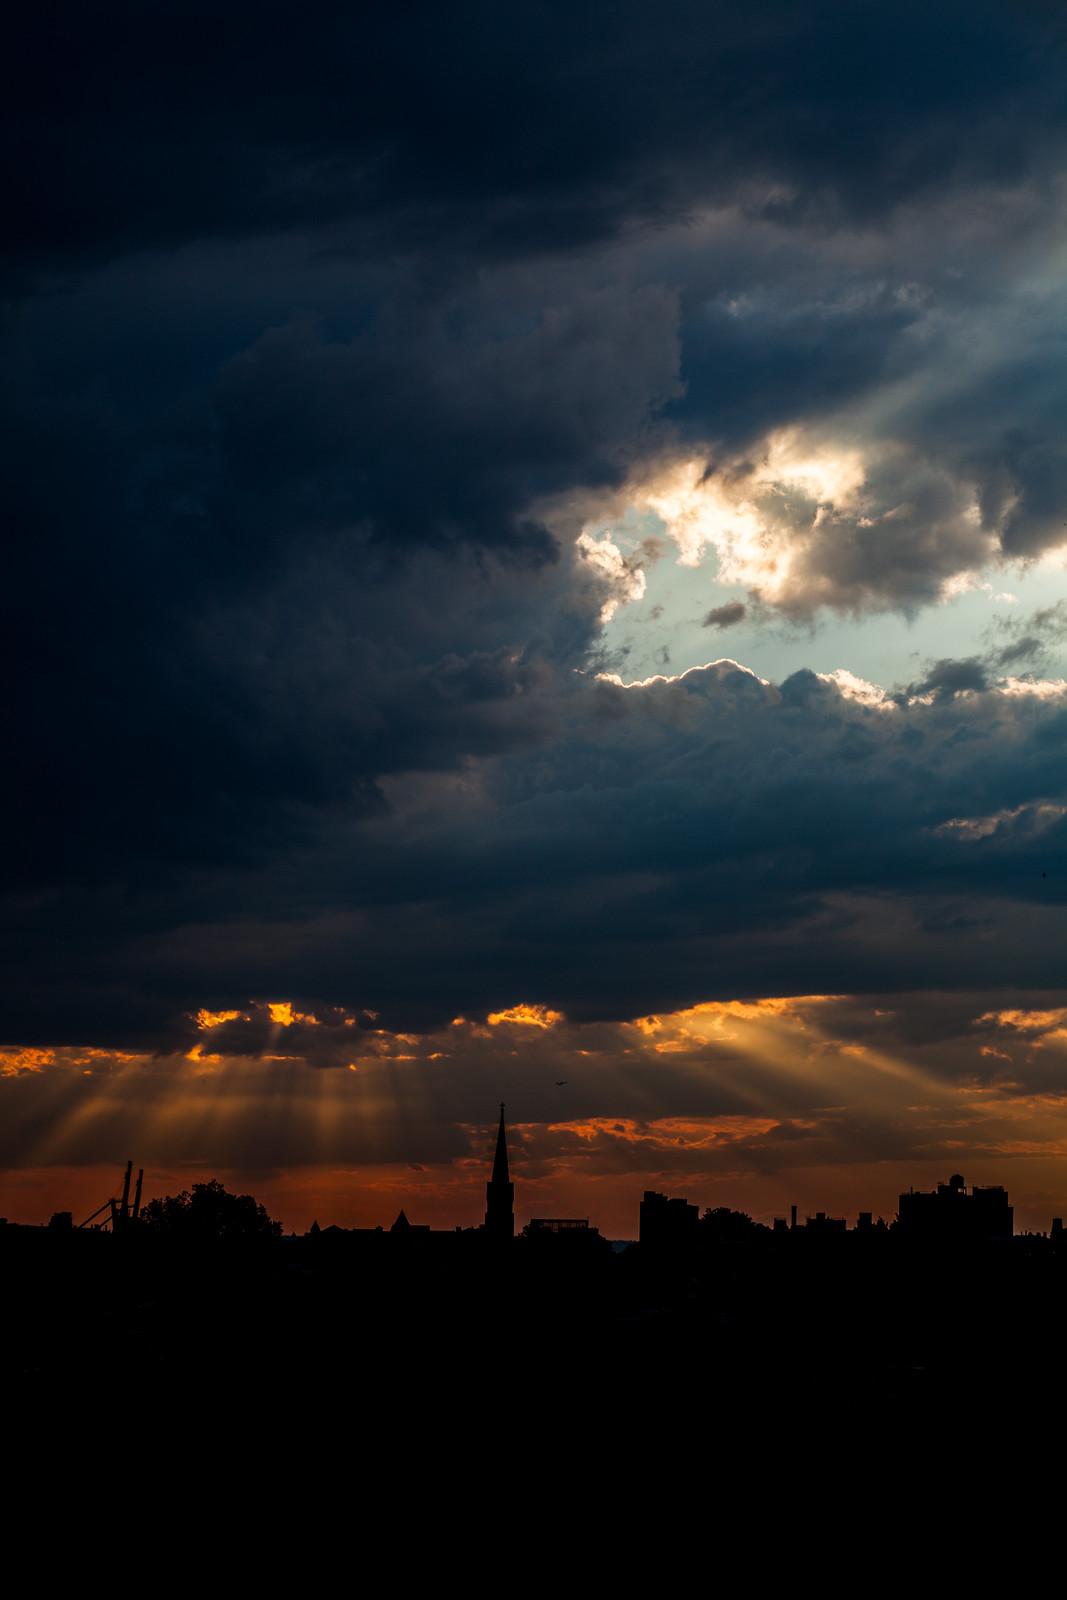 Sunset over Brooklyn by wwward0